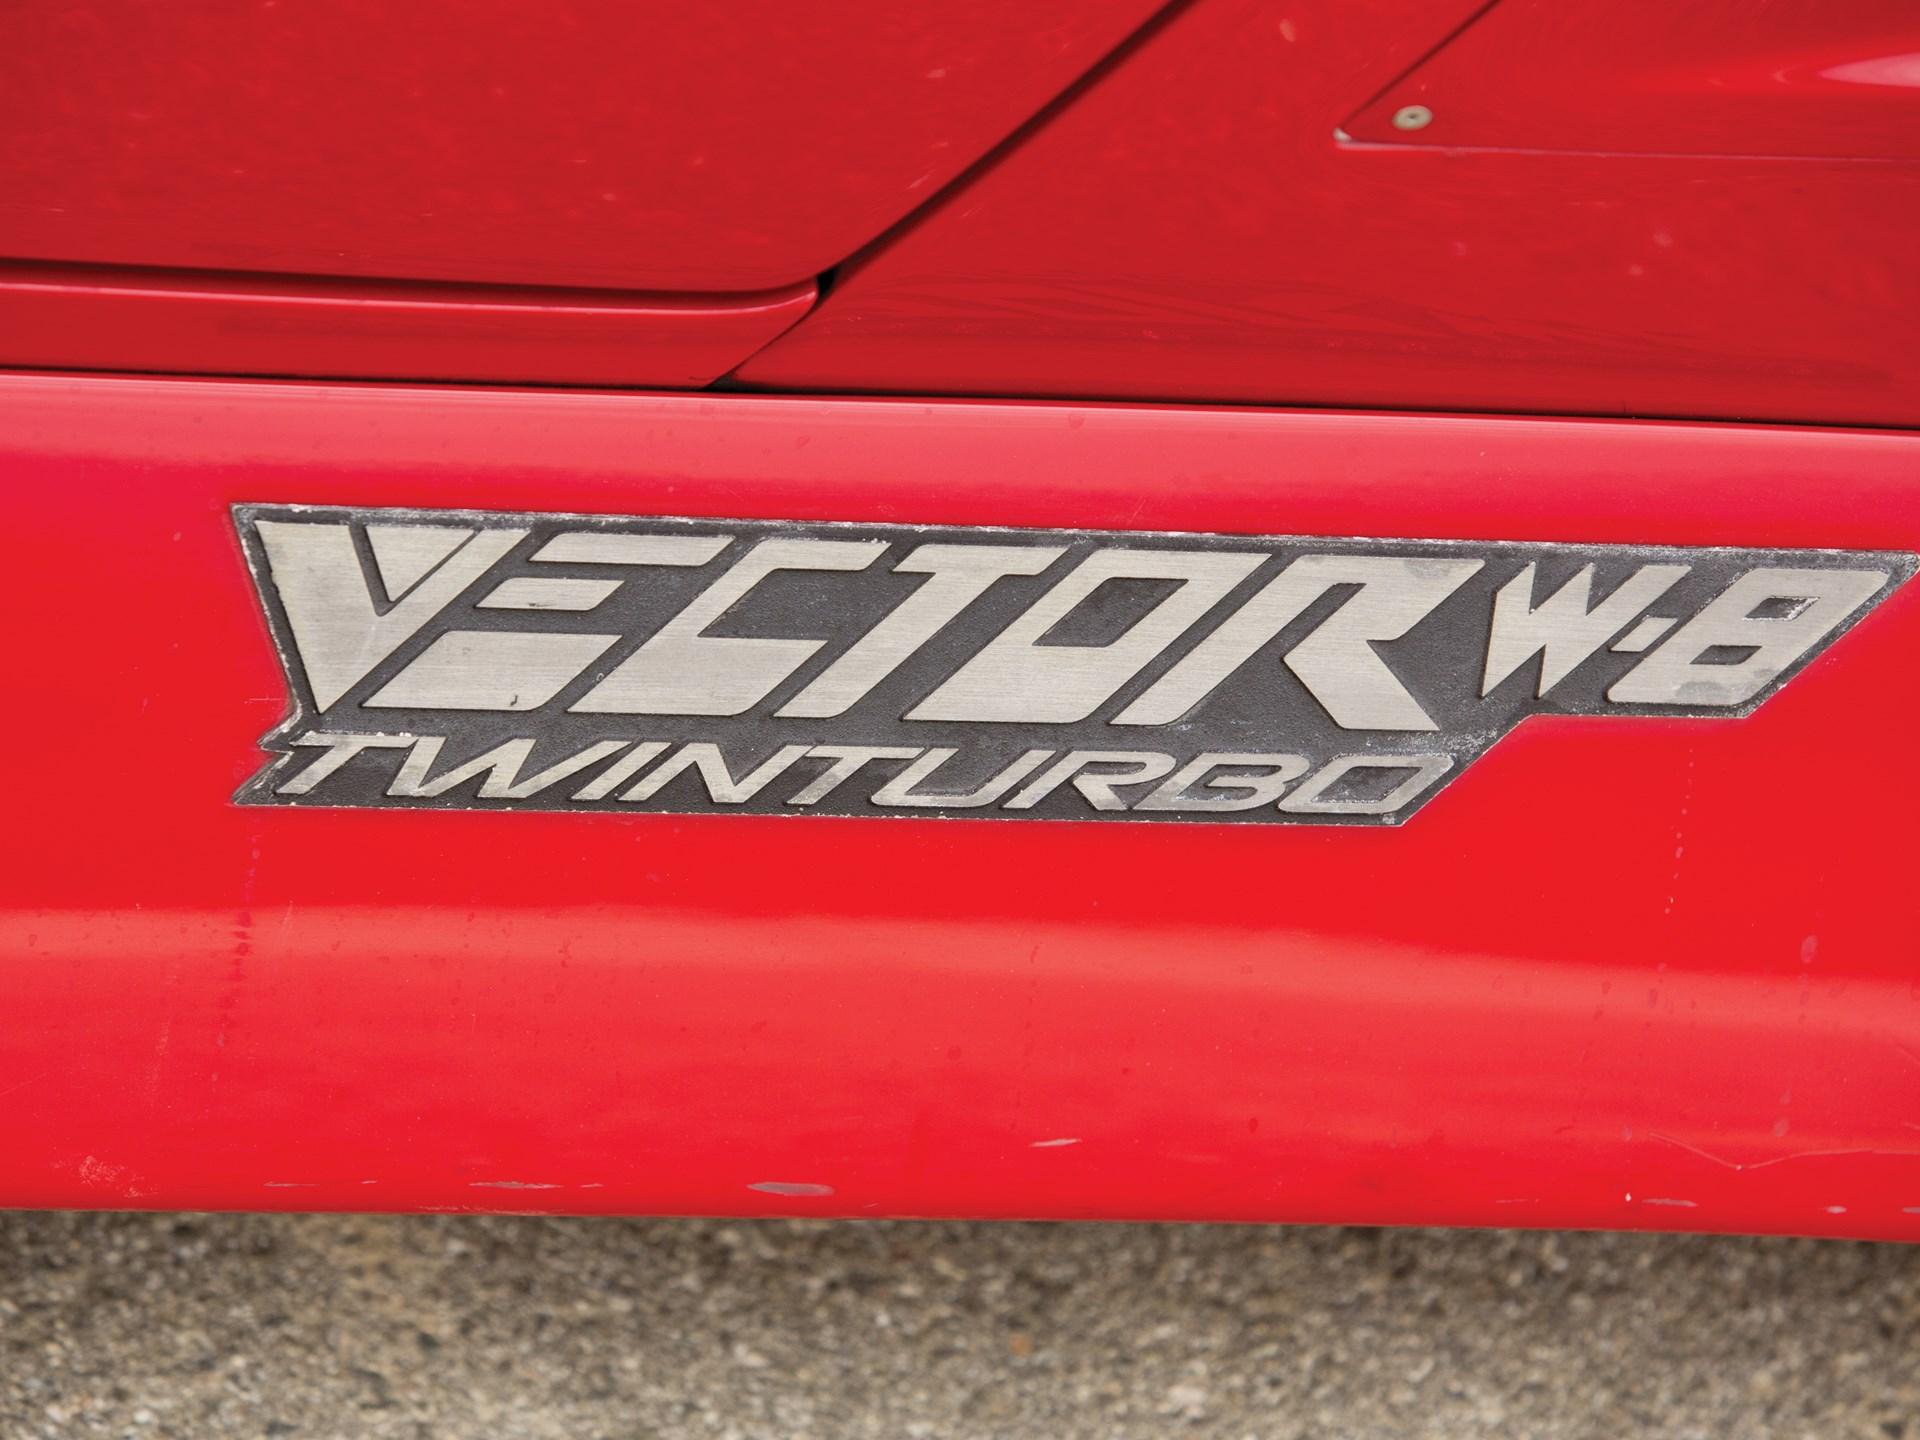 1992 Vector W8 Twin Turbo